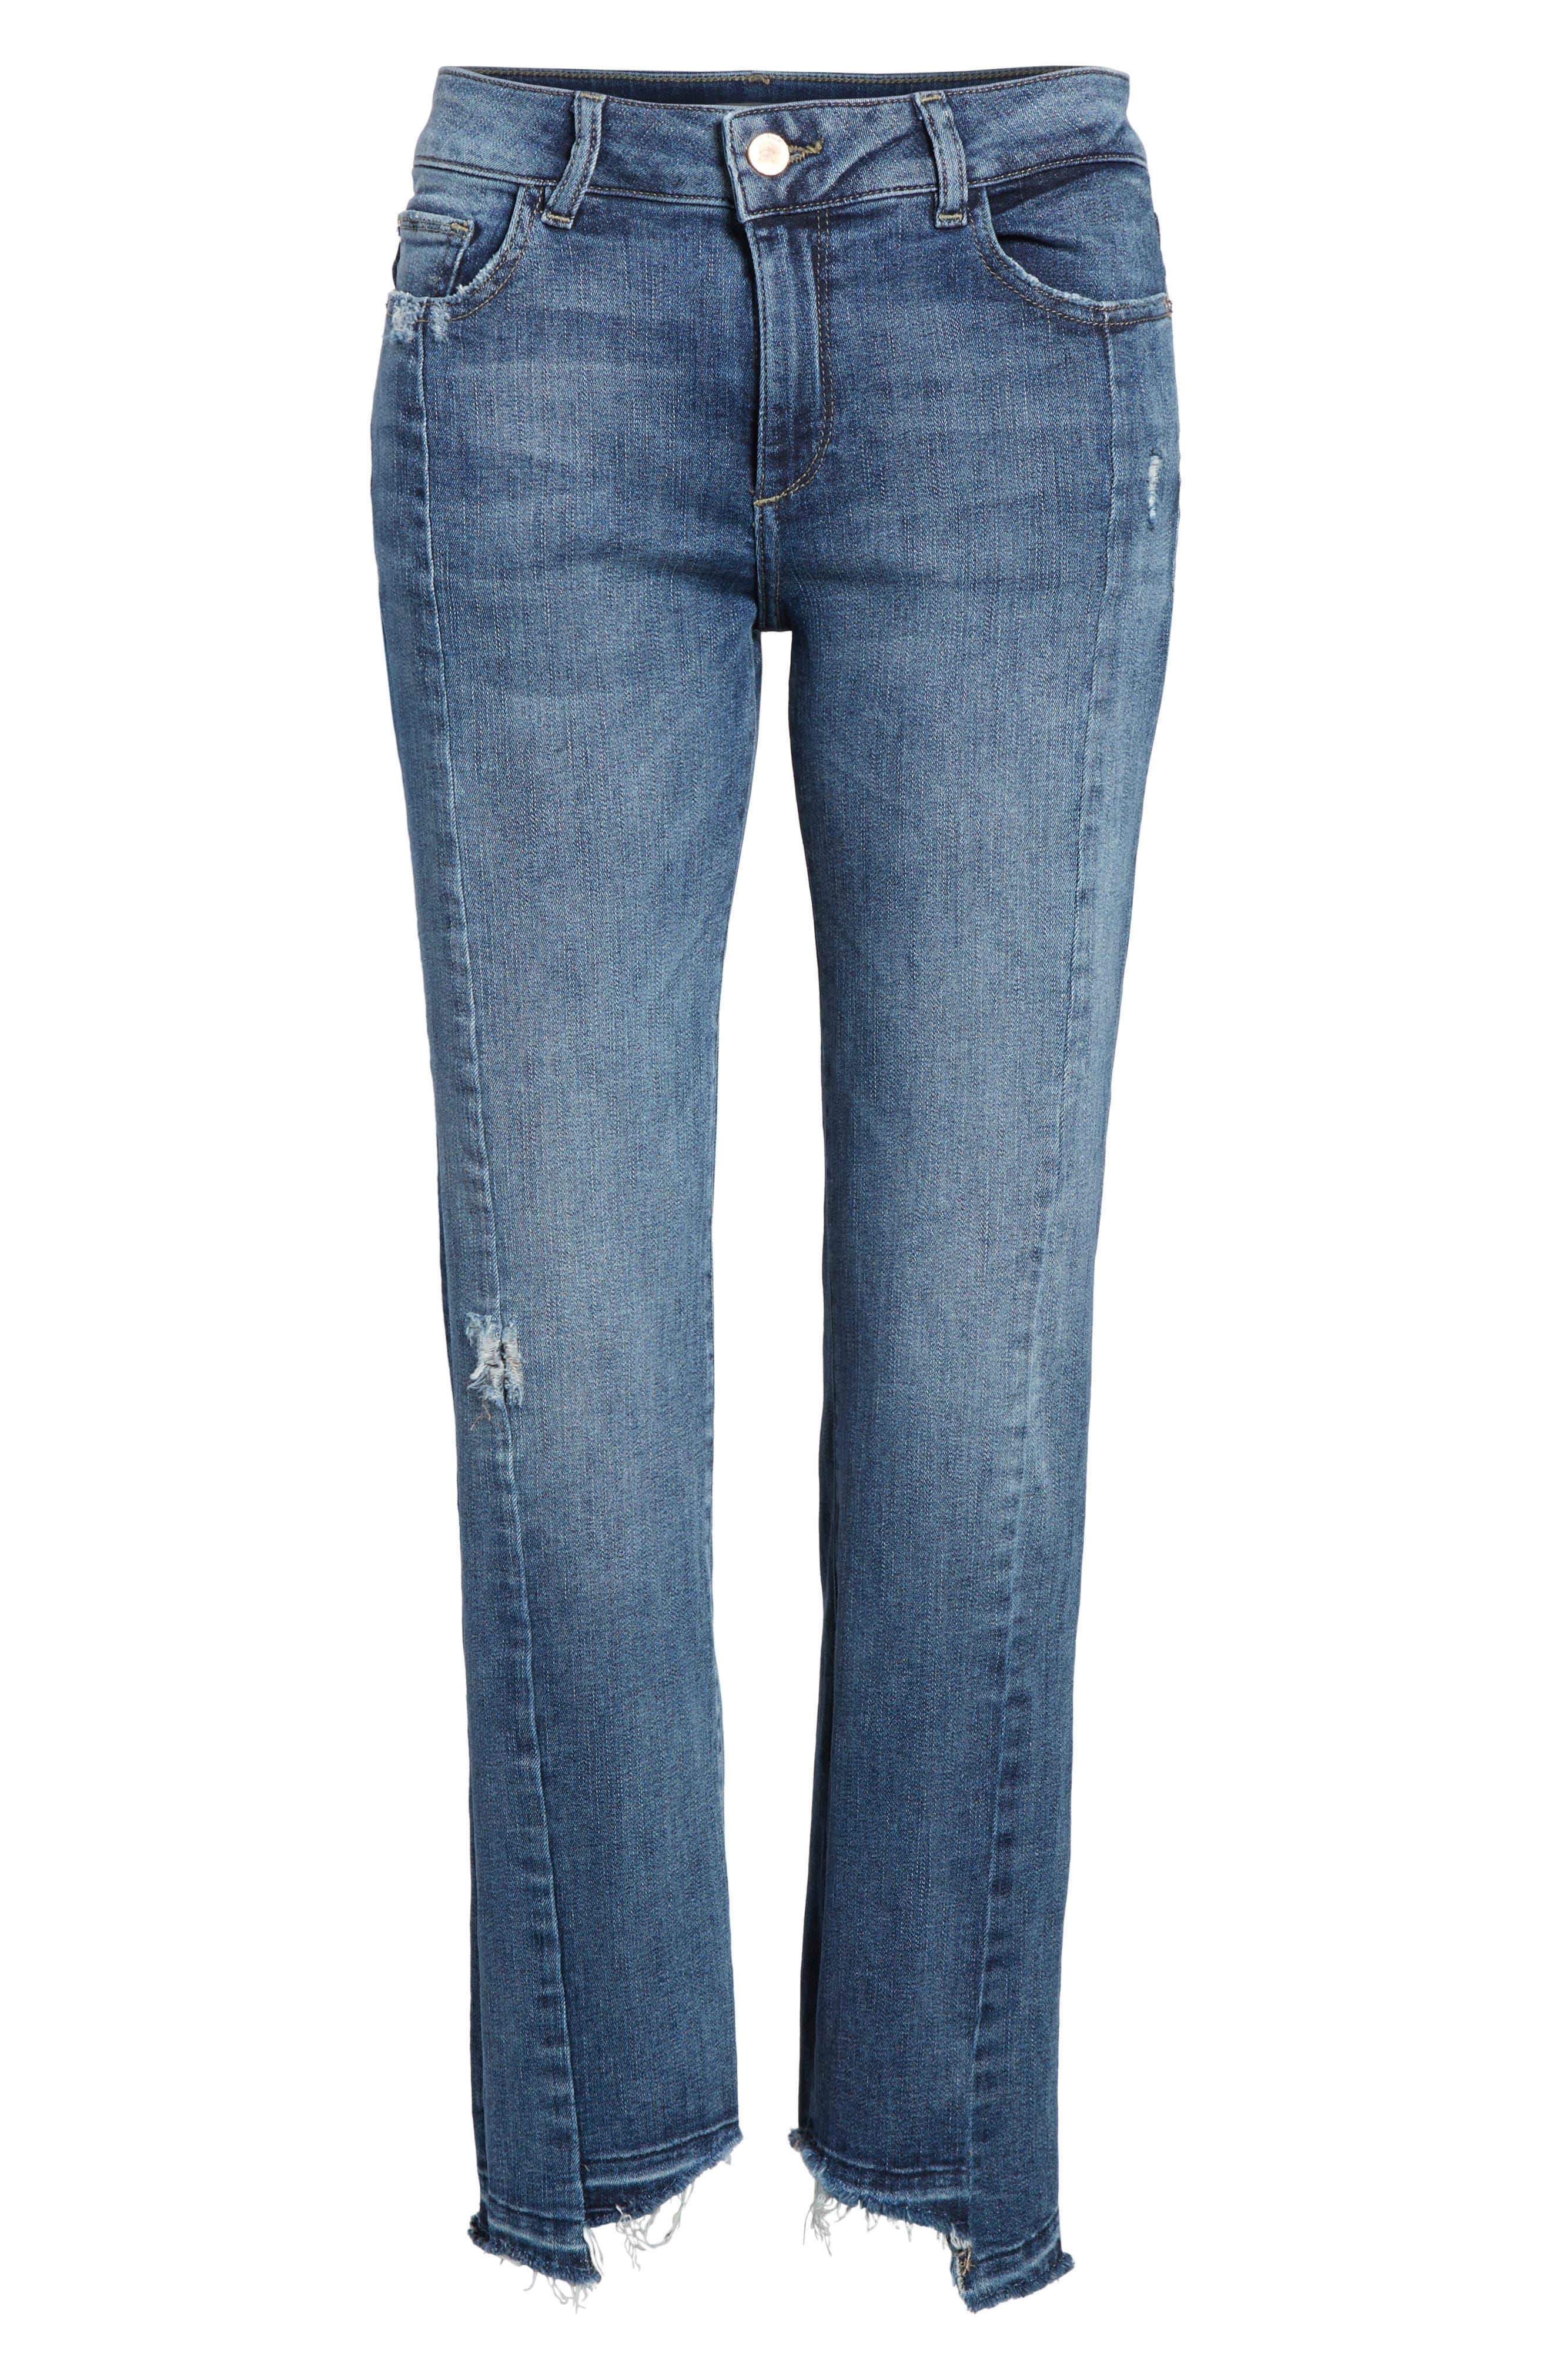 Mara Instasculpt Ankle Straight Leg Jeans,                             Alternate thumbnail 7, color,                             426